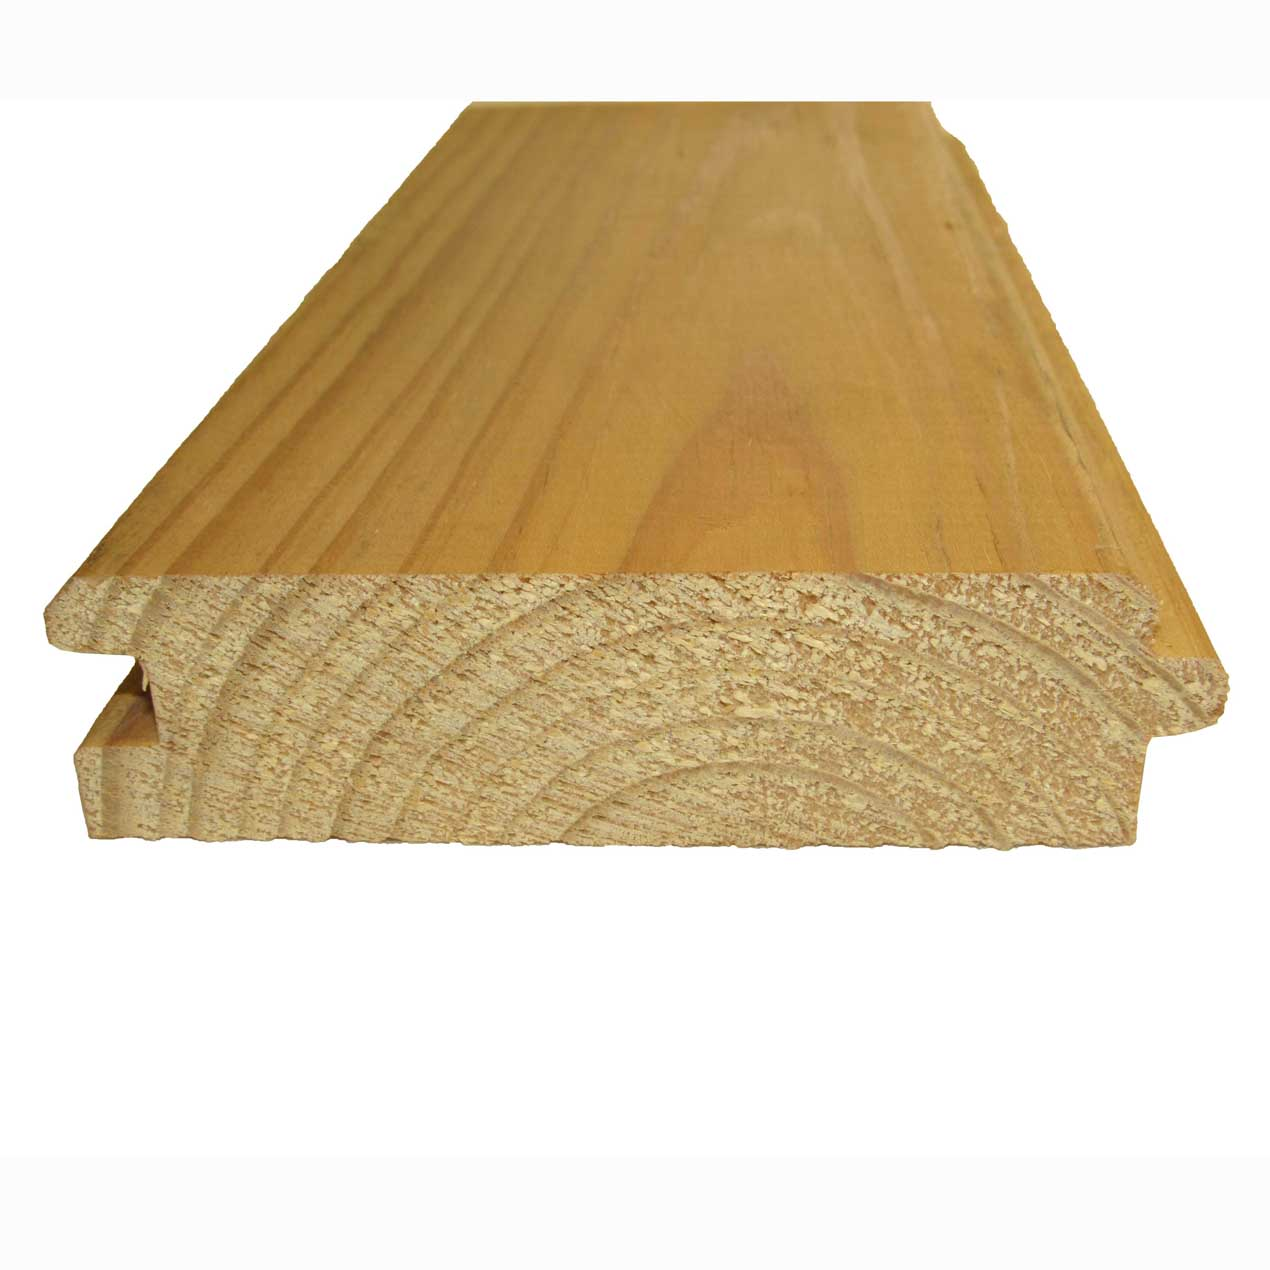 2x6 T G Yp Flooring Ceiling Capitol City Lumber